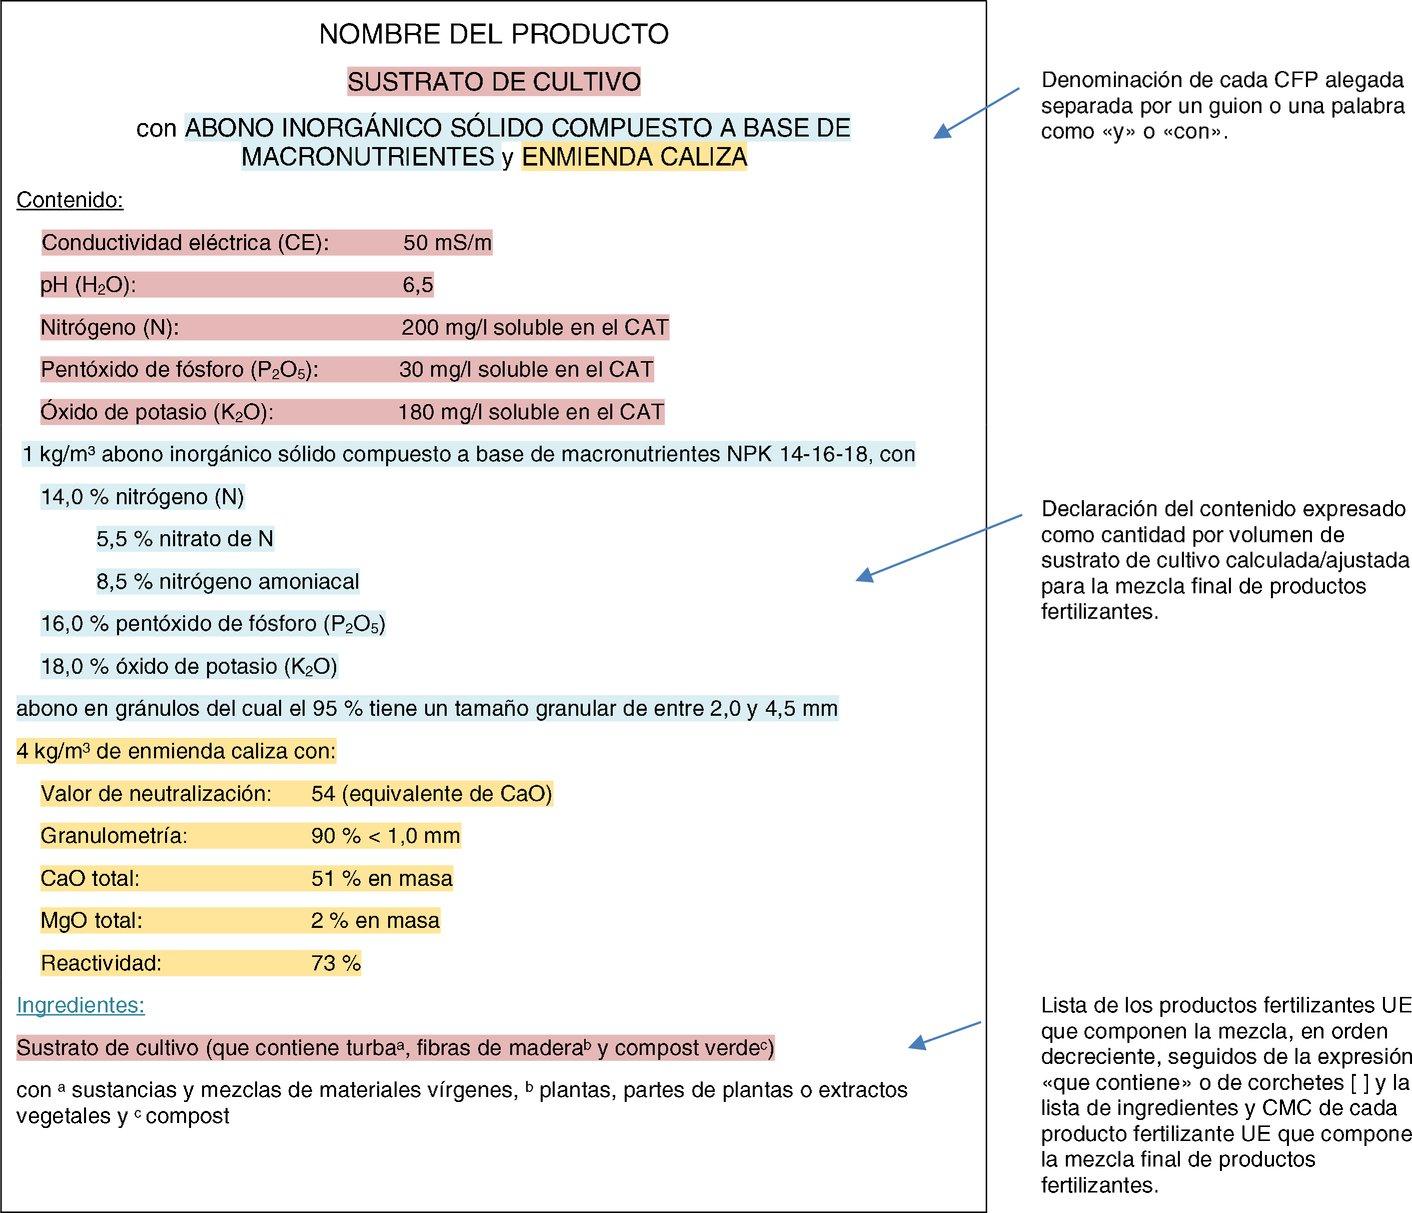 Imagen: http://publications.europa.eu/resource/uriserv/OJ.C_.2021.119.01.0001.01.SPA.xhtml.C_2021119ES.01004001.tif.jpg